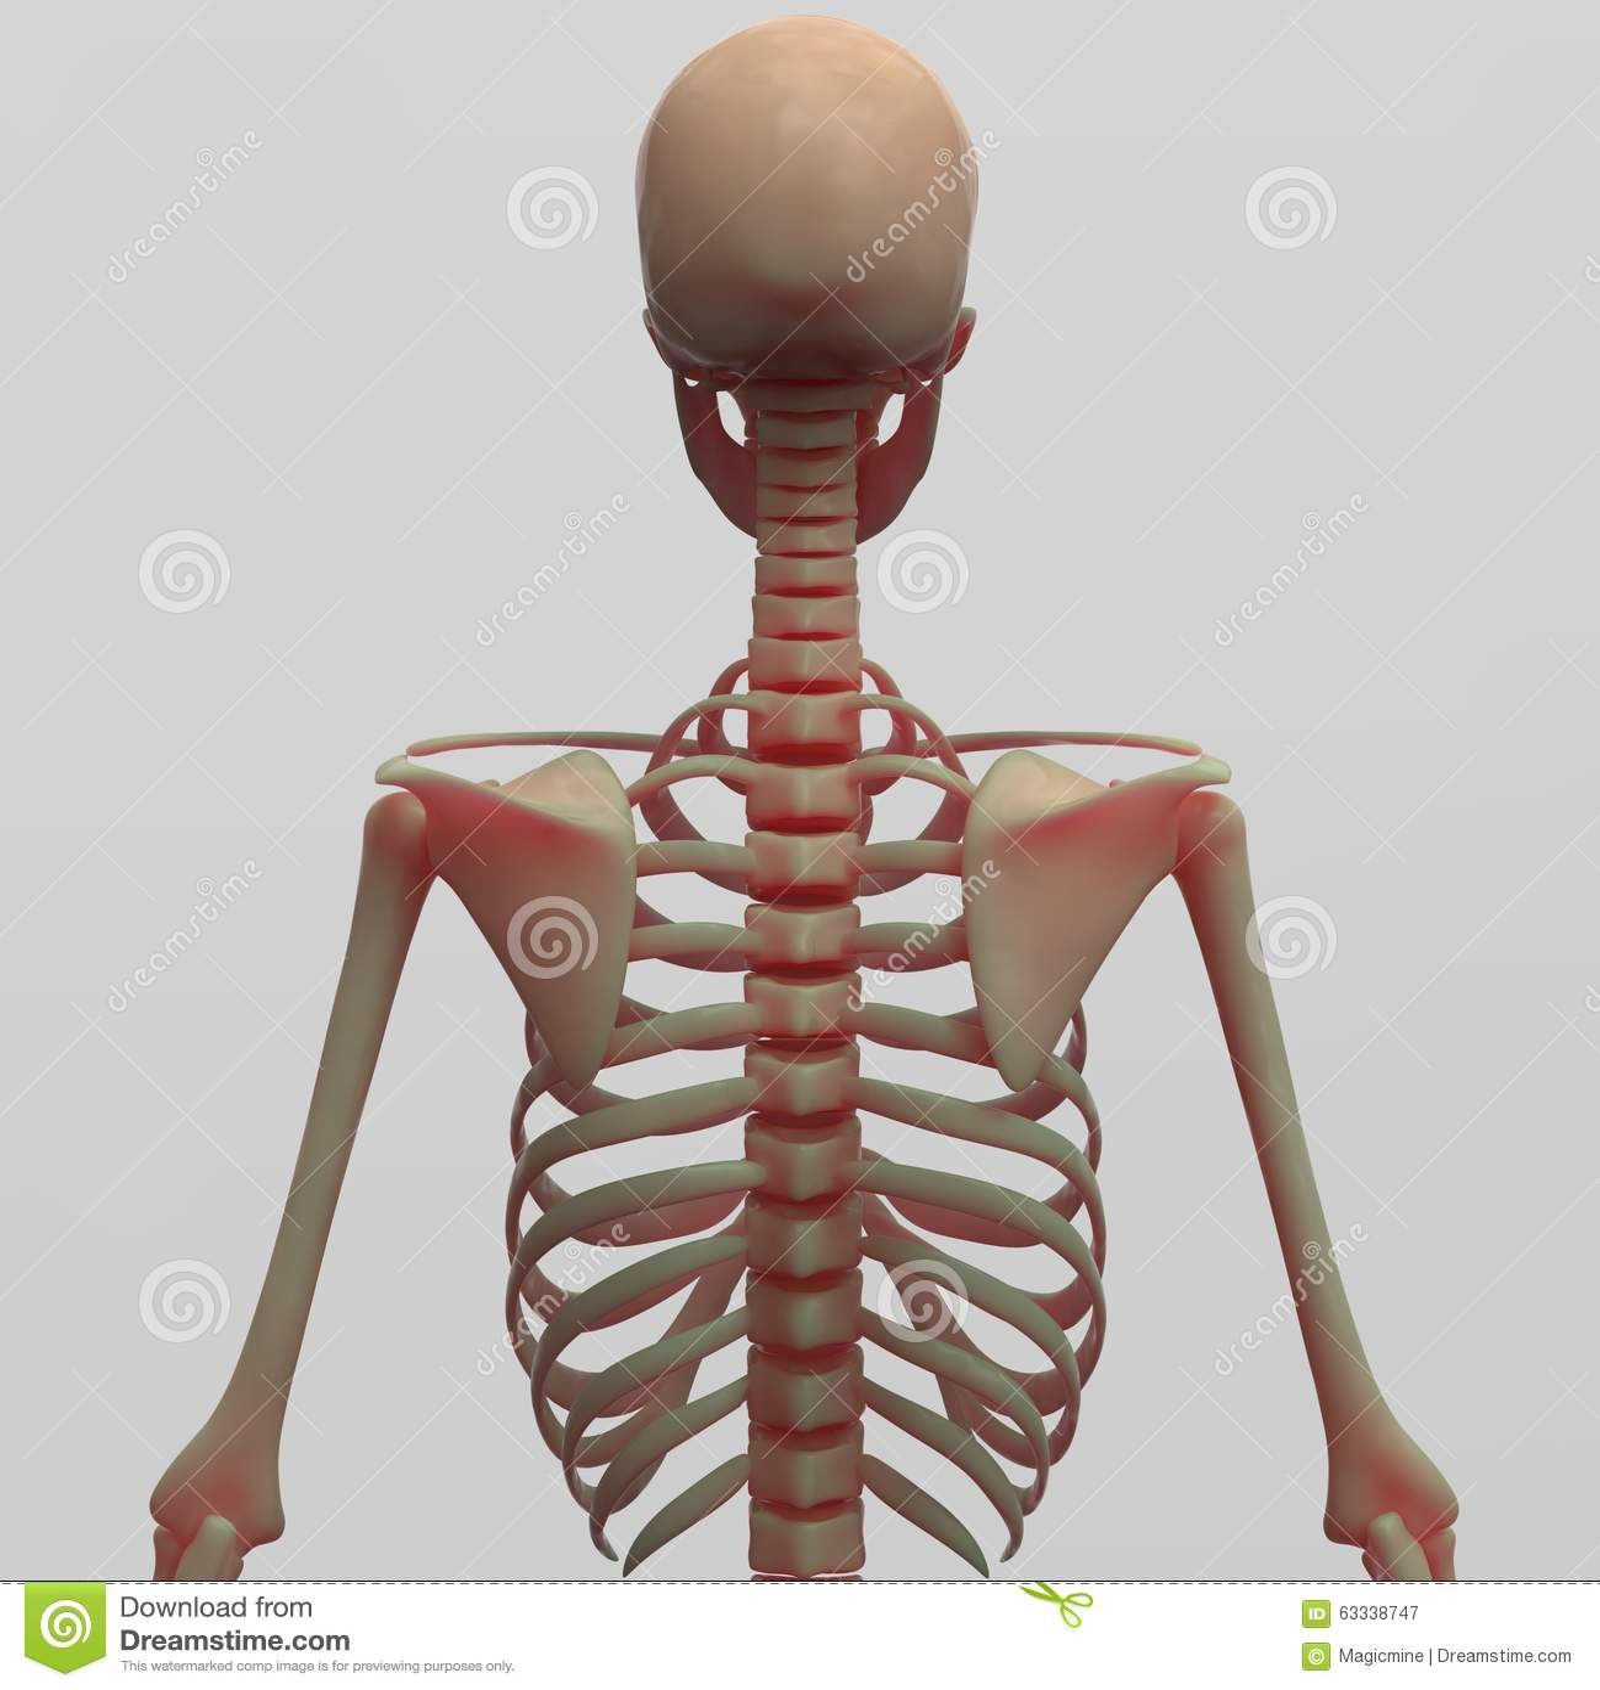 Human Skeleton Ribs Back View